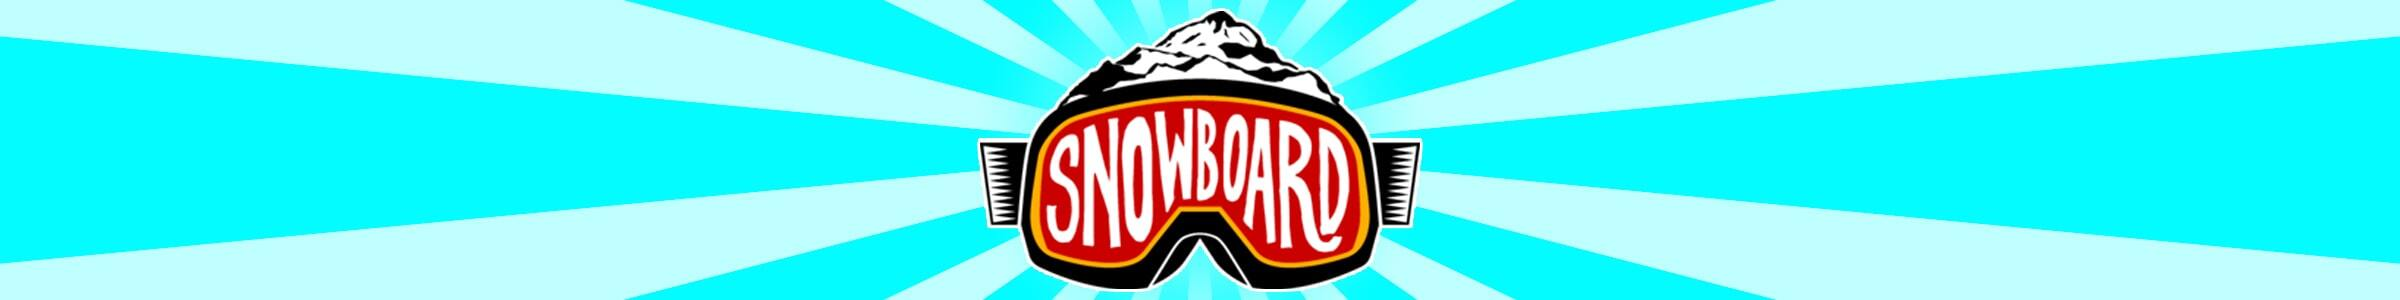 Category_Teaser_Header_Snowboard_2400x300